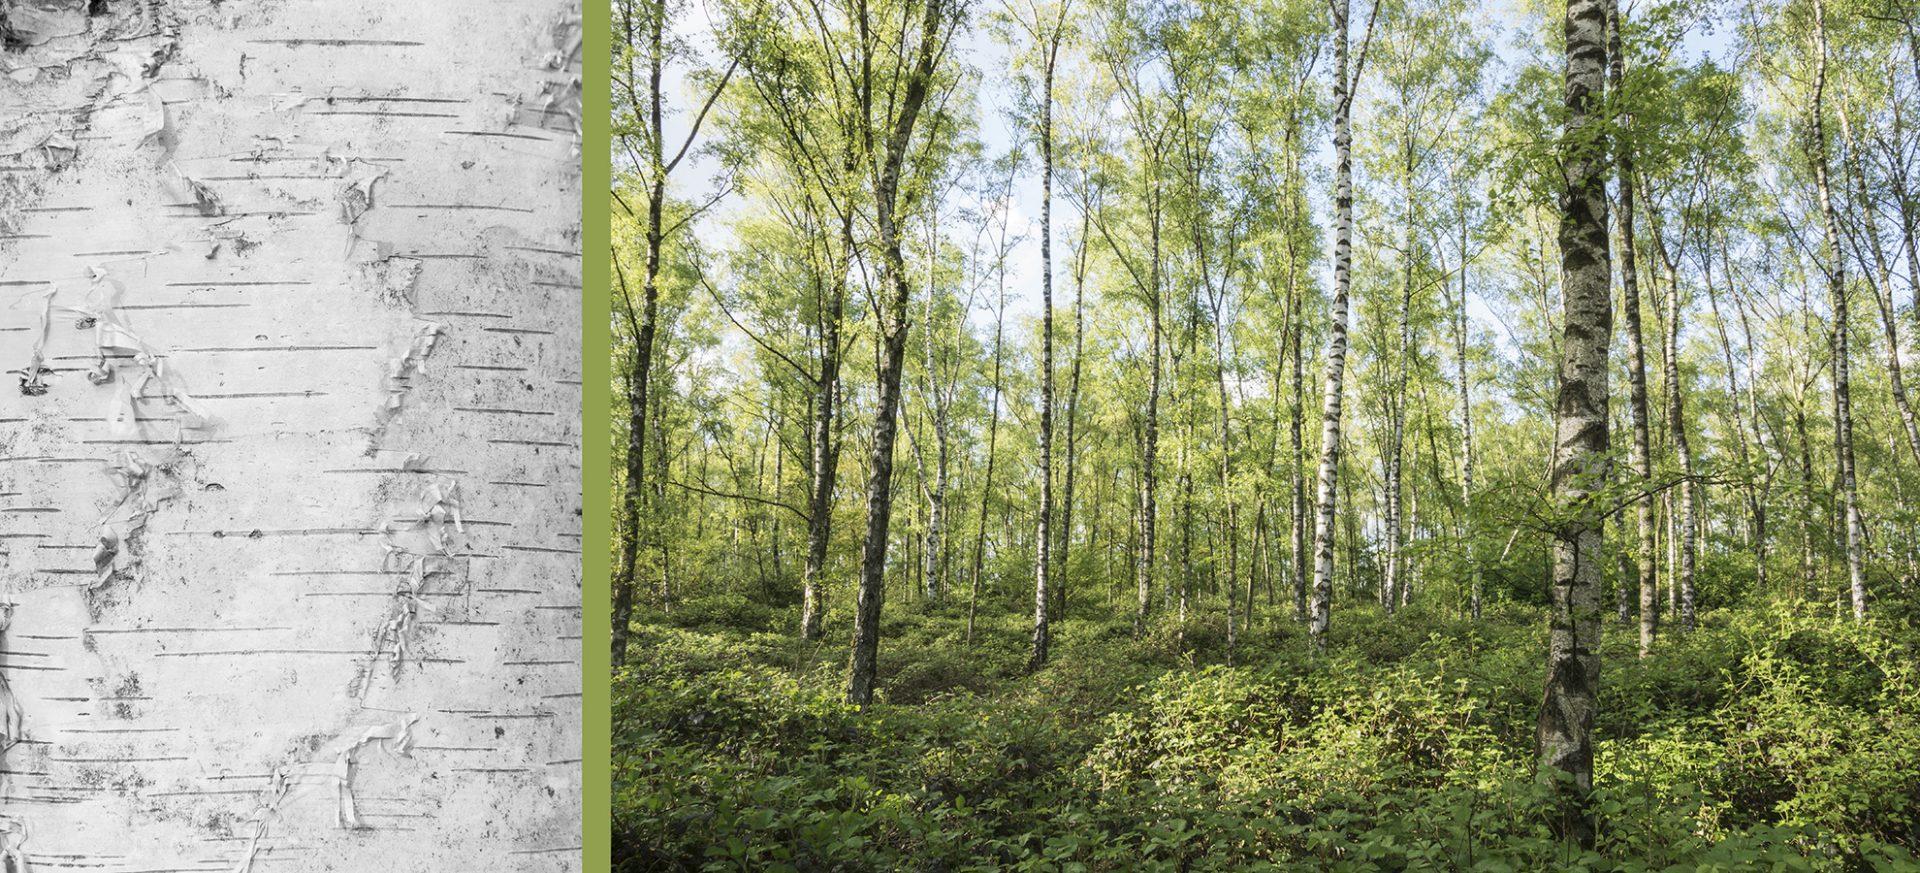 WaldRindenDoppel Birken II • Lambda-Print auf KODAK Pro Endura, Alu-Dibond®, 110 x 50 cm, gerahmt als Art-Box • Auflage: 5 + 2 Artist's Proof